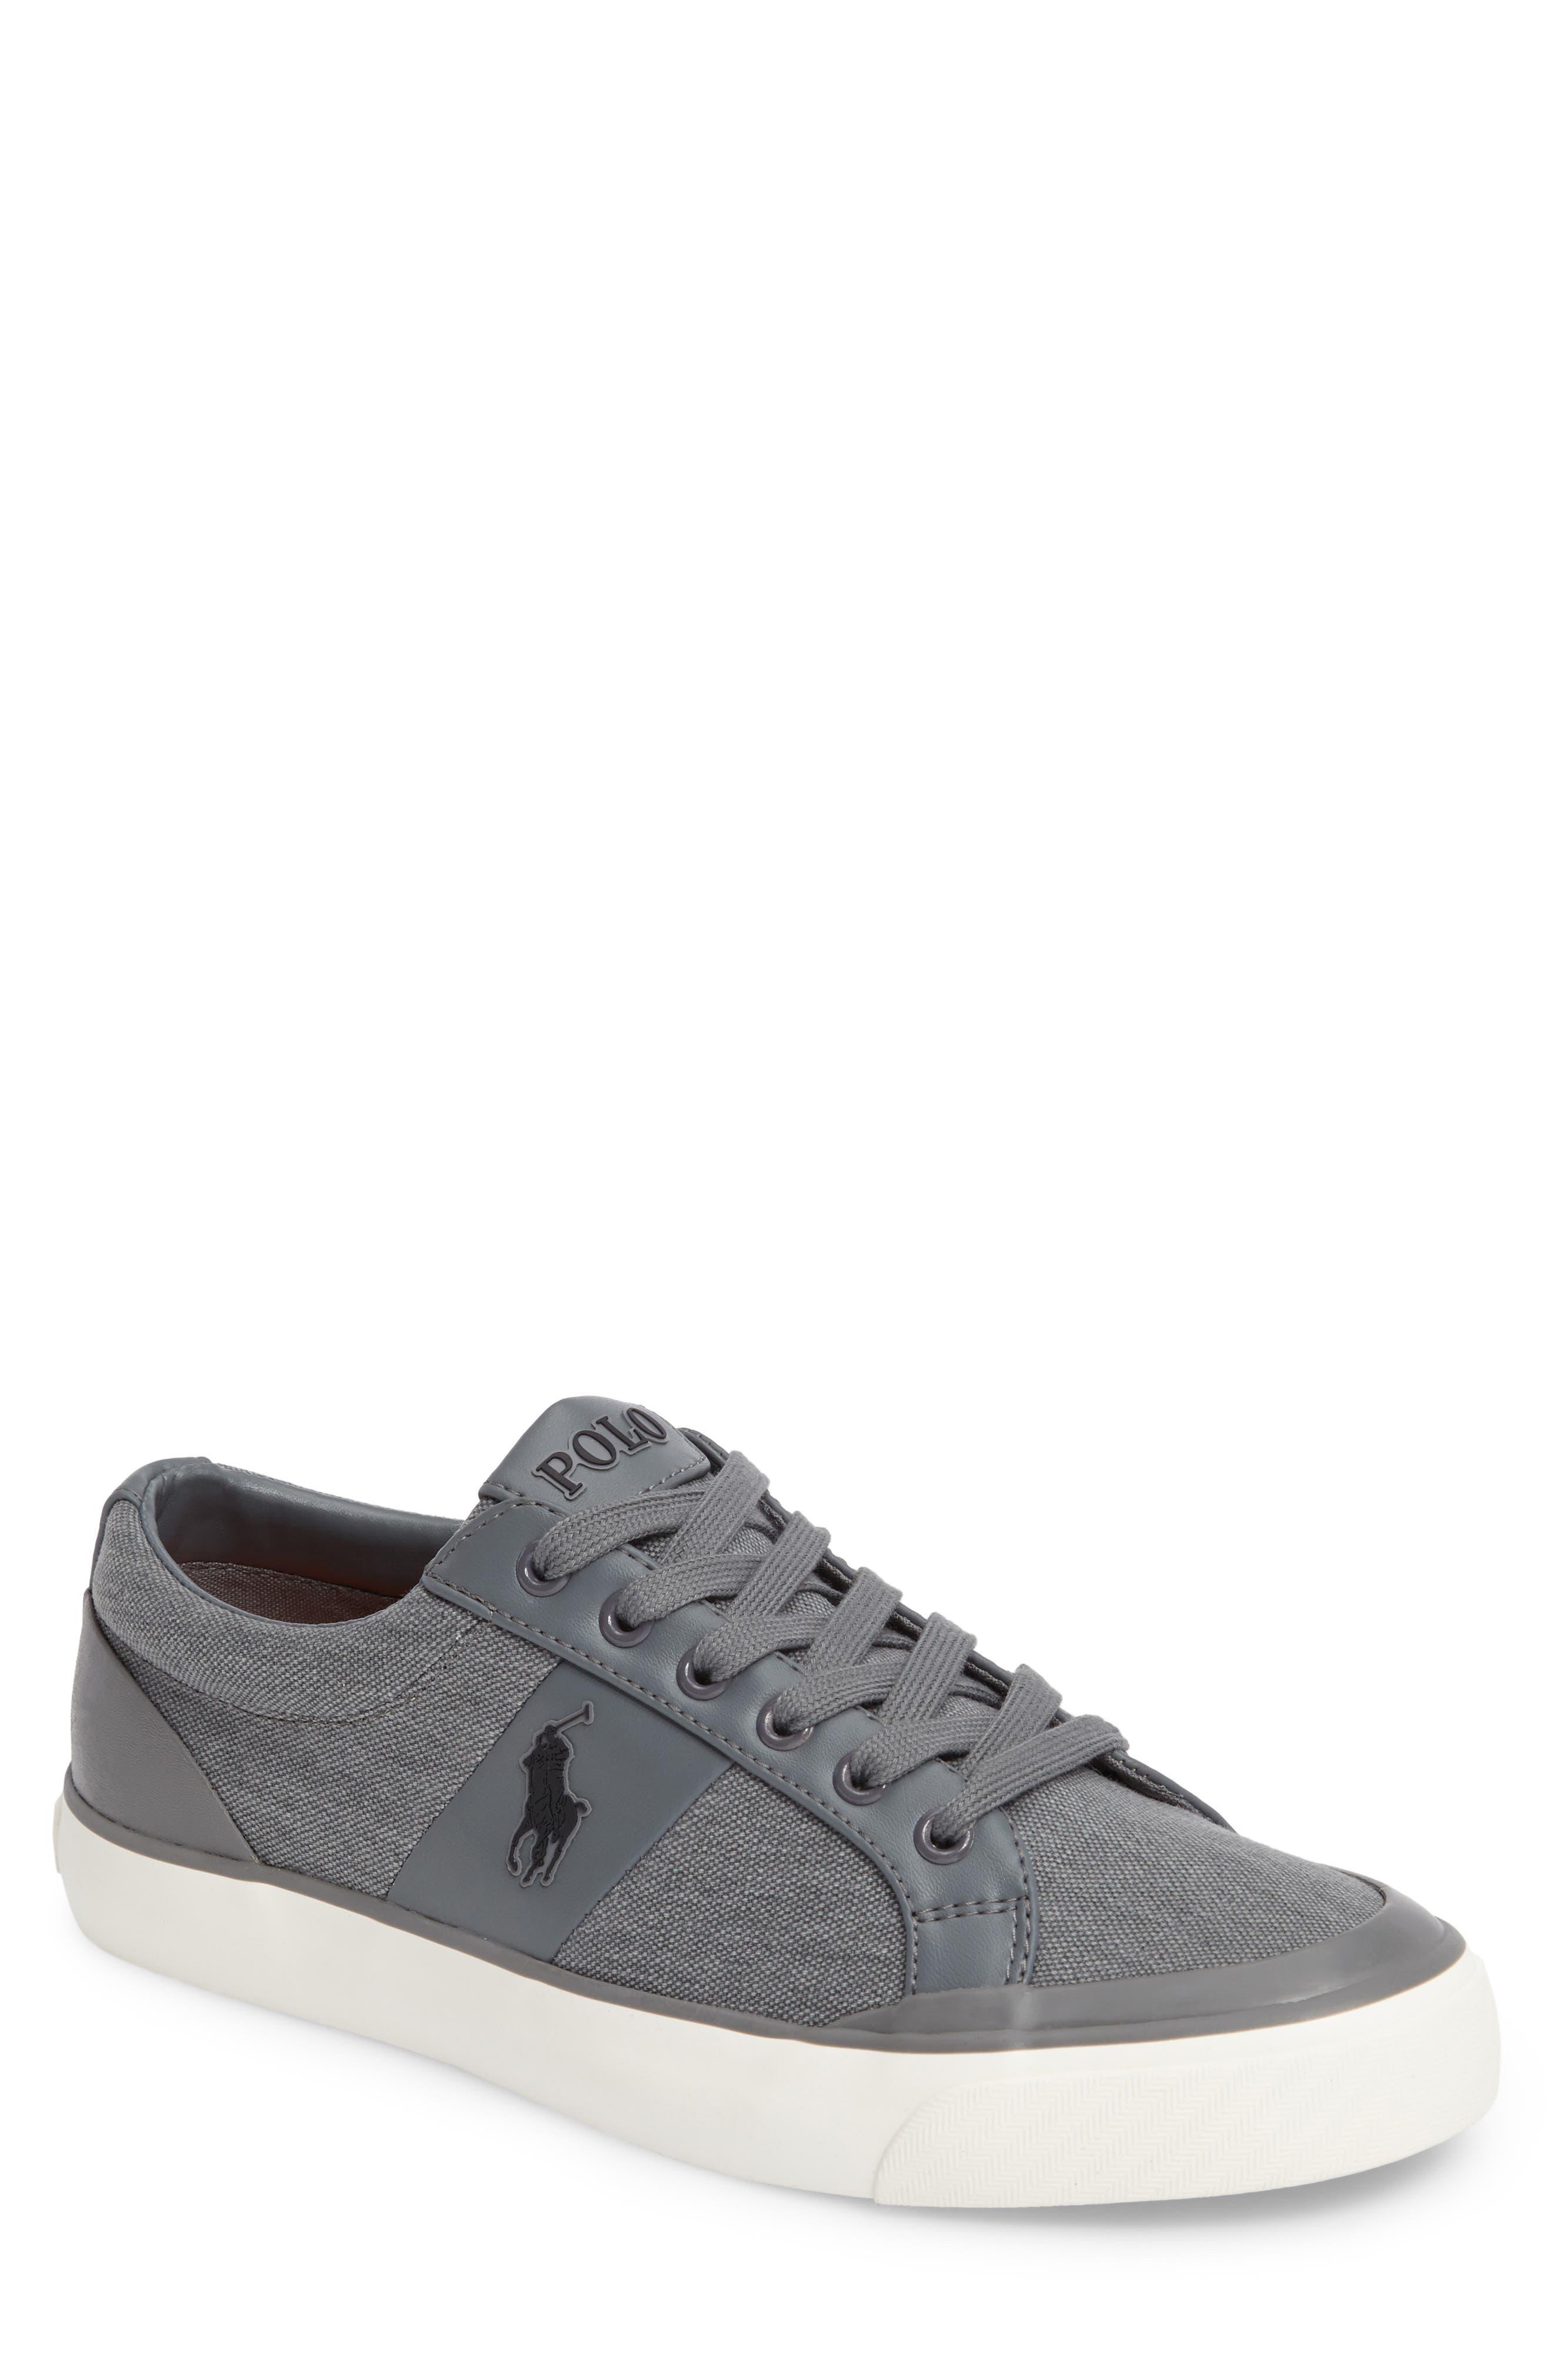 Polo Ralph Lauren Ian Sneaker,                         Main,                         color,